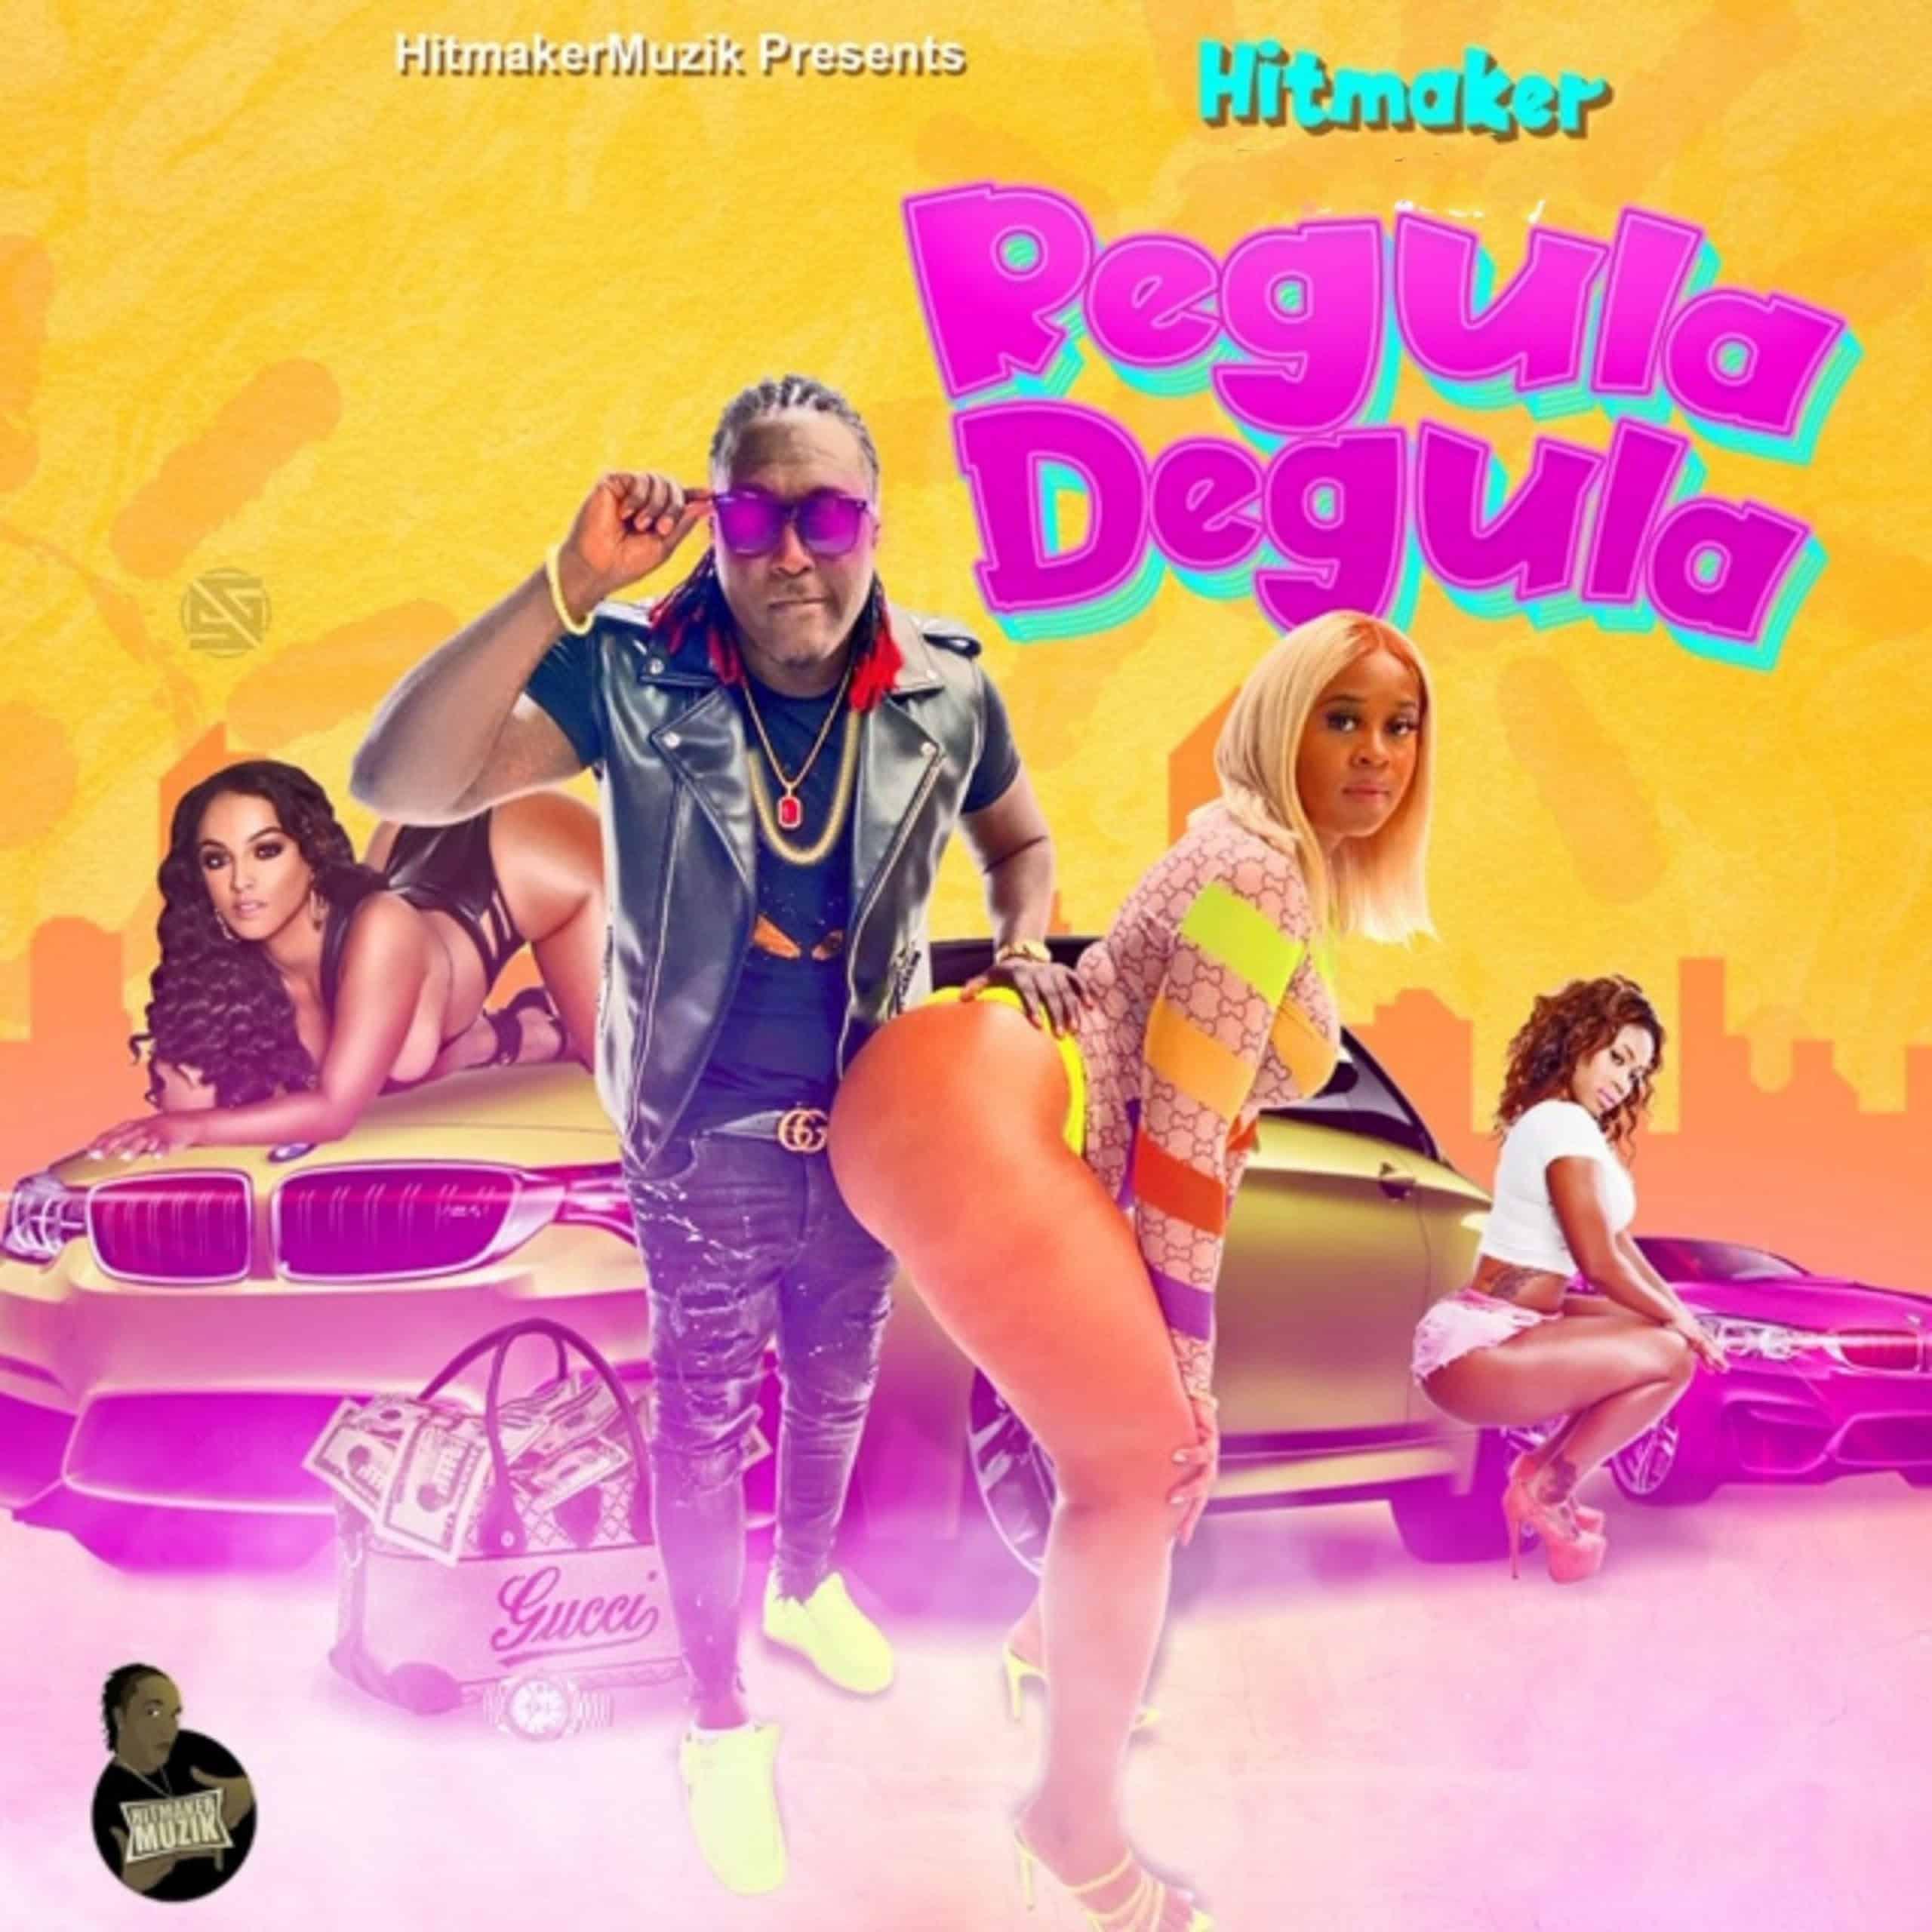 Hitmaker - Regula Degula (Dancehall)